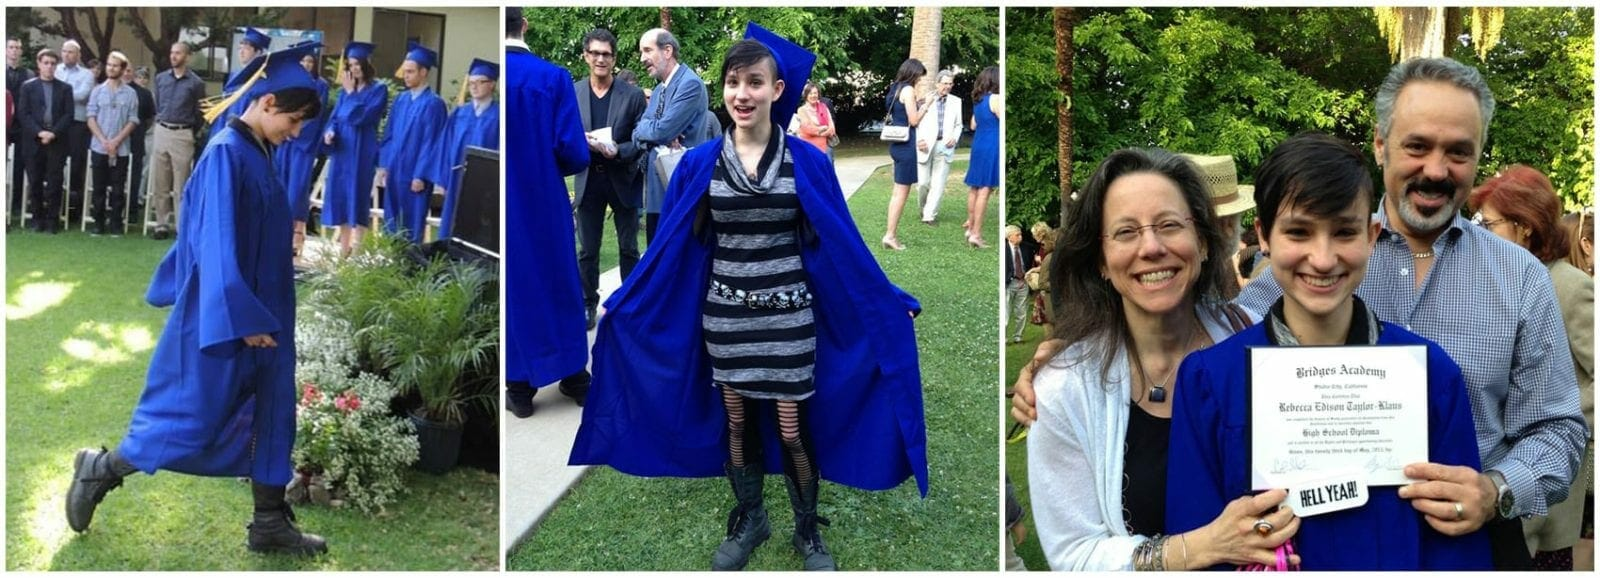 Bex Taylor-Klaus at her high school graduation.